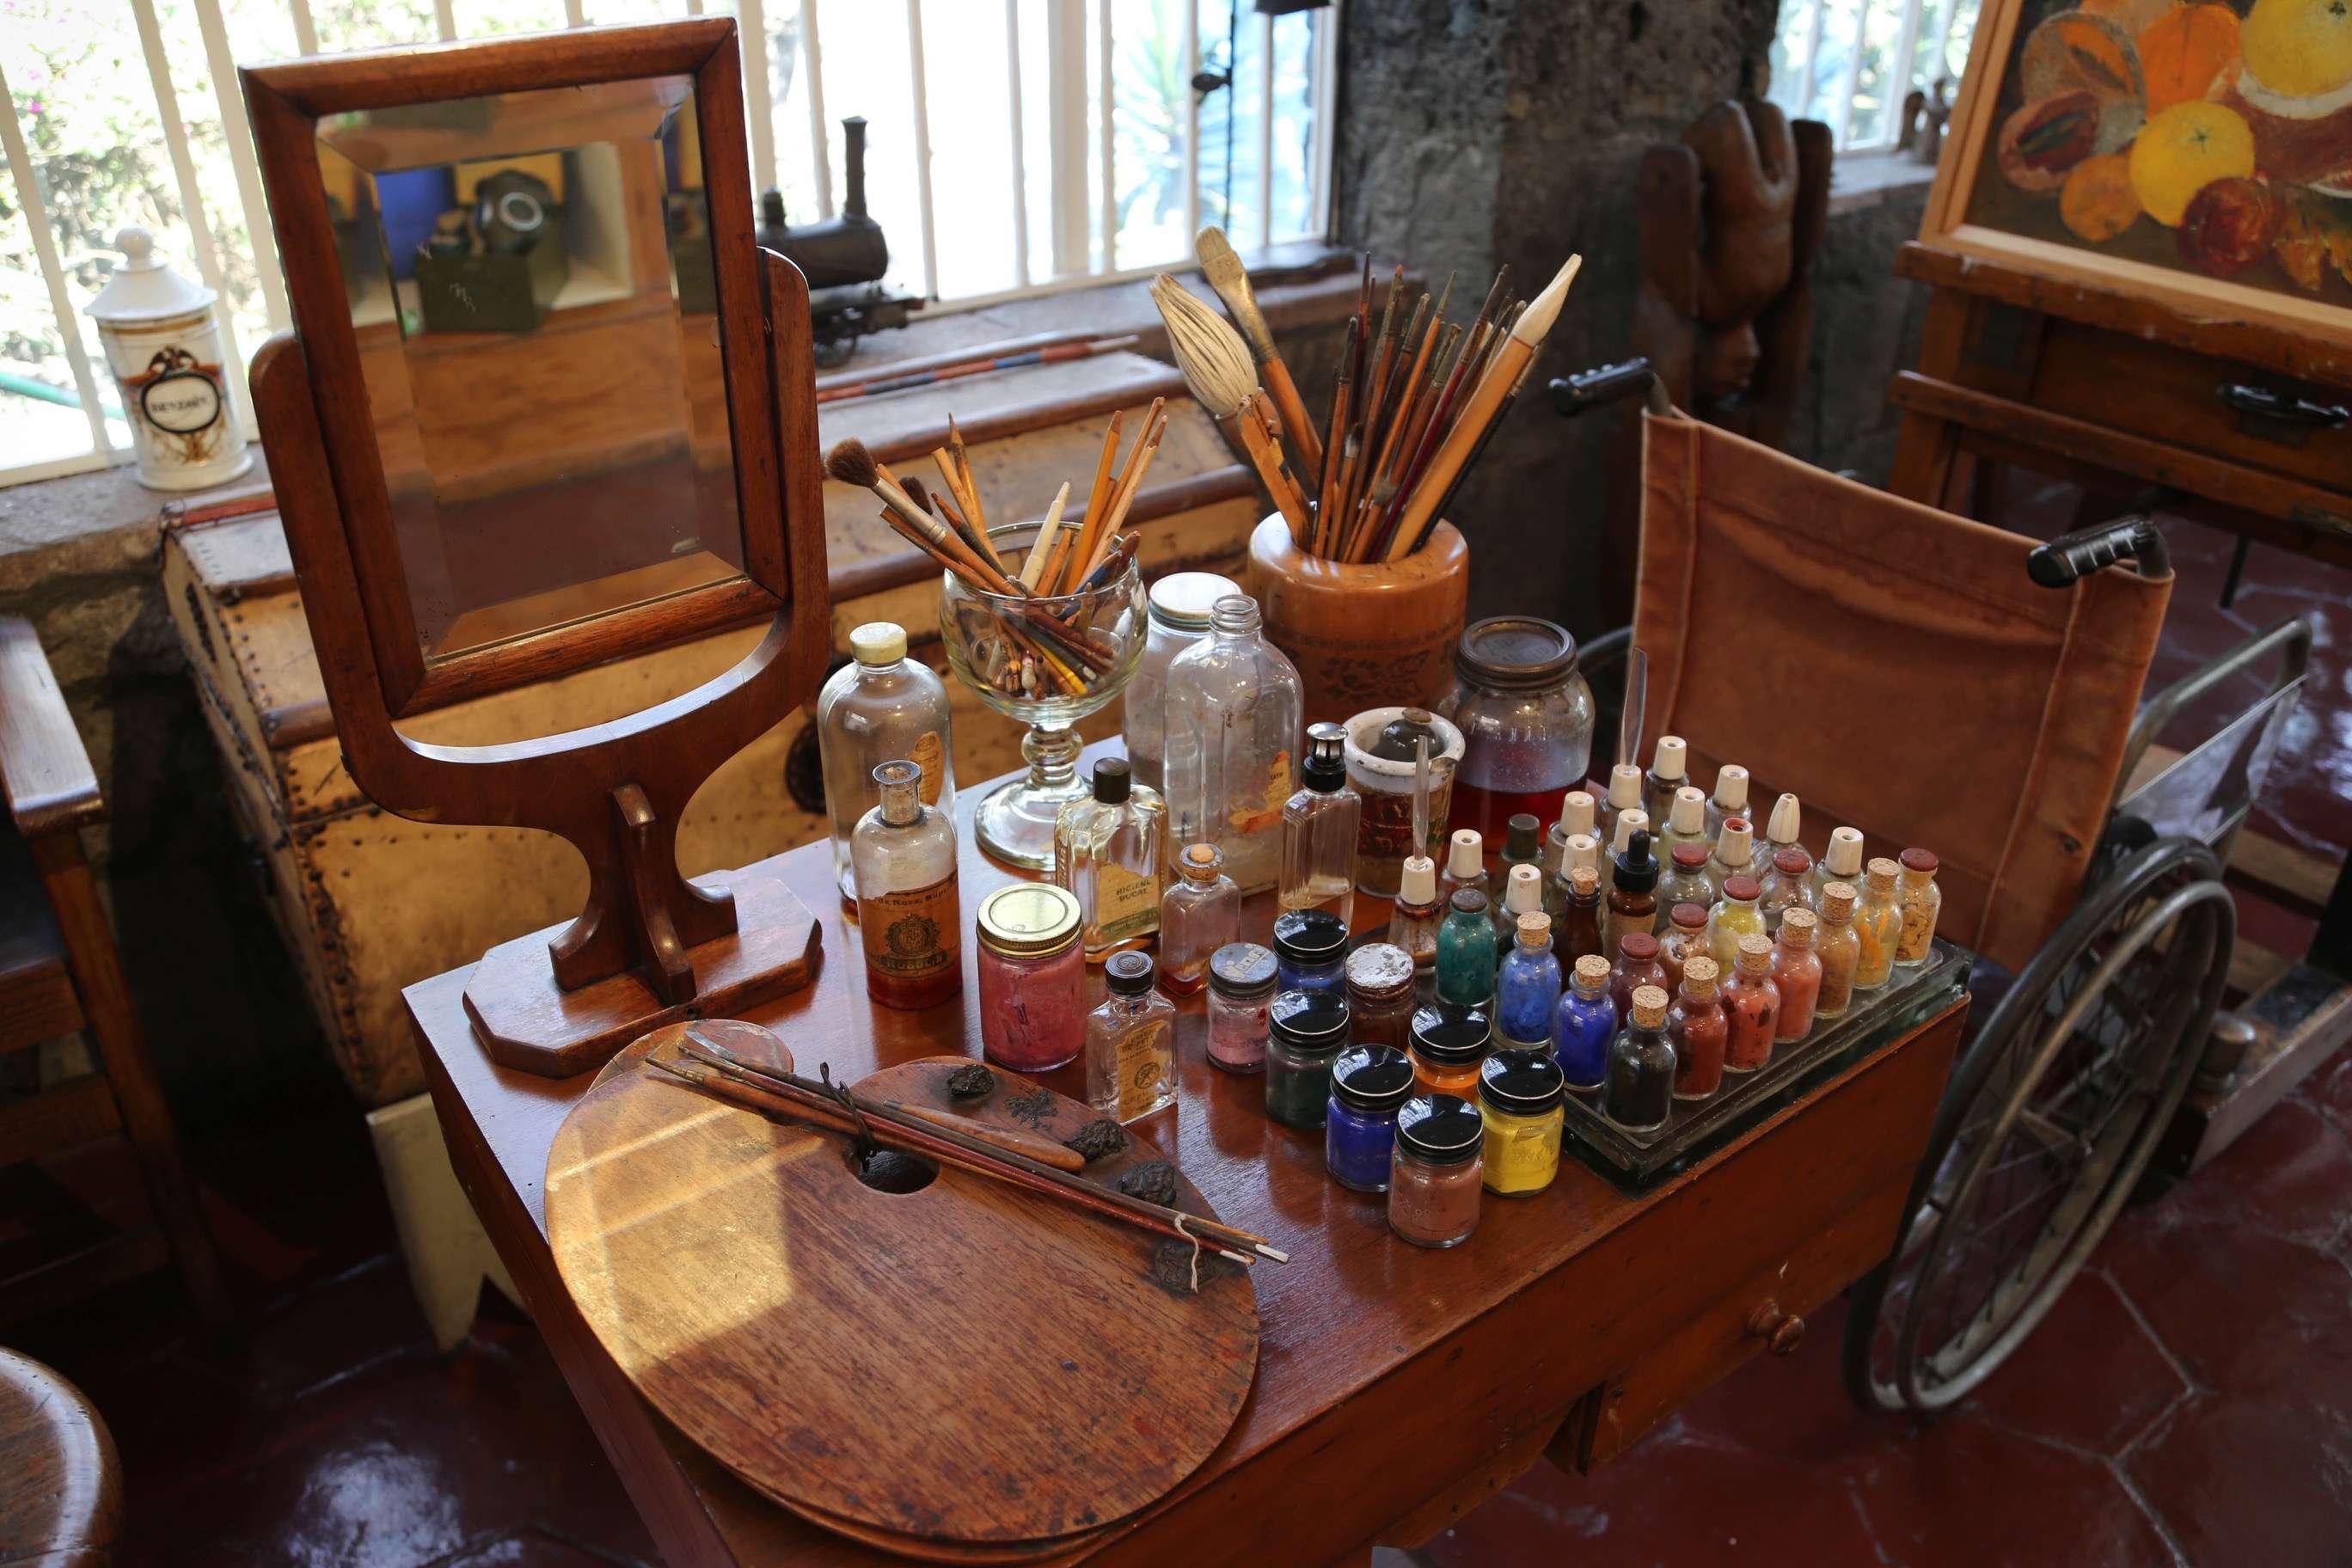 Frida Kahlo's studio was upstairs at Casa Azul.